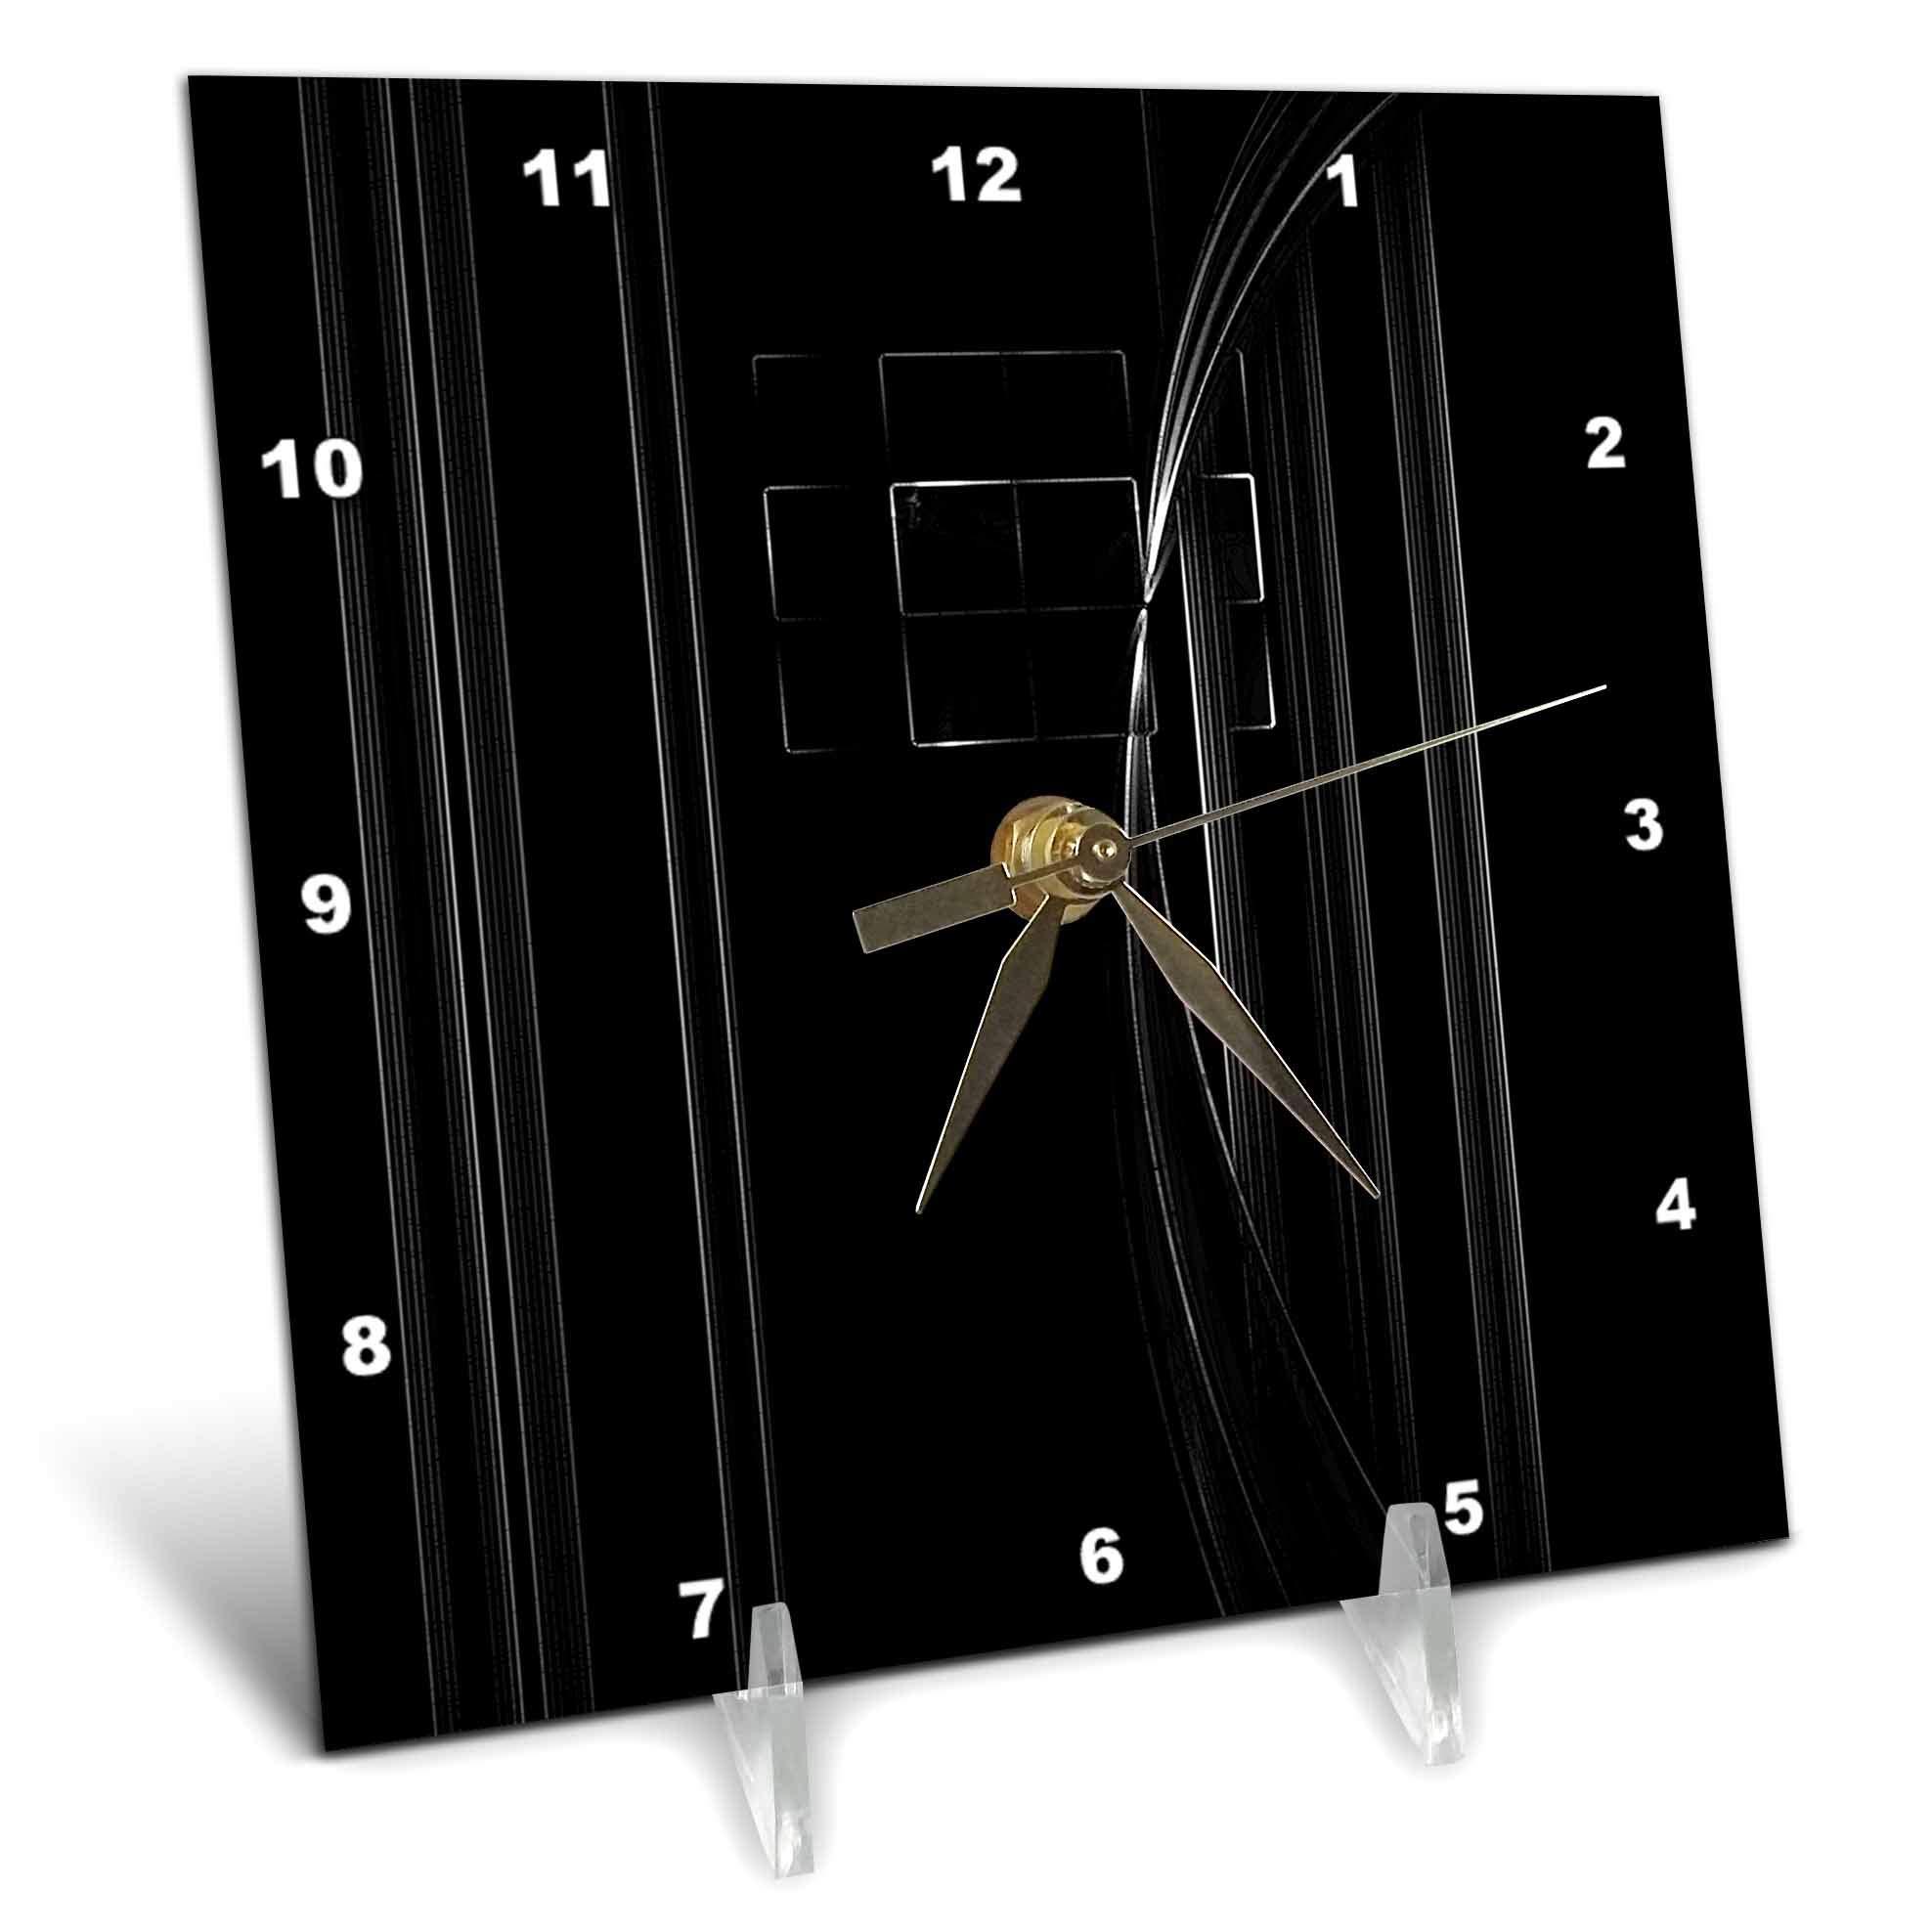 3dRose Digital Art by Brandi - Finding Light - Abstract of light coming through a window - 6x6 Desk Clock (dc_289205_1)